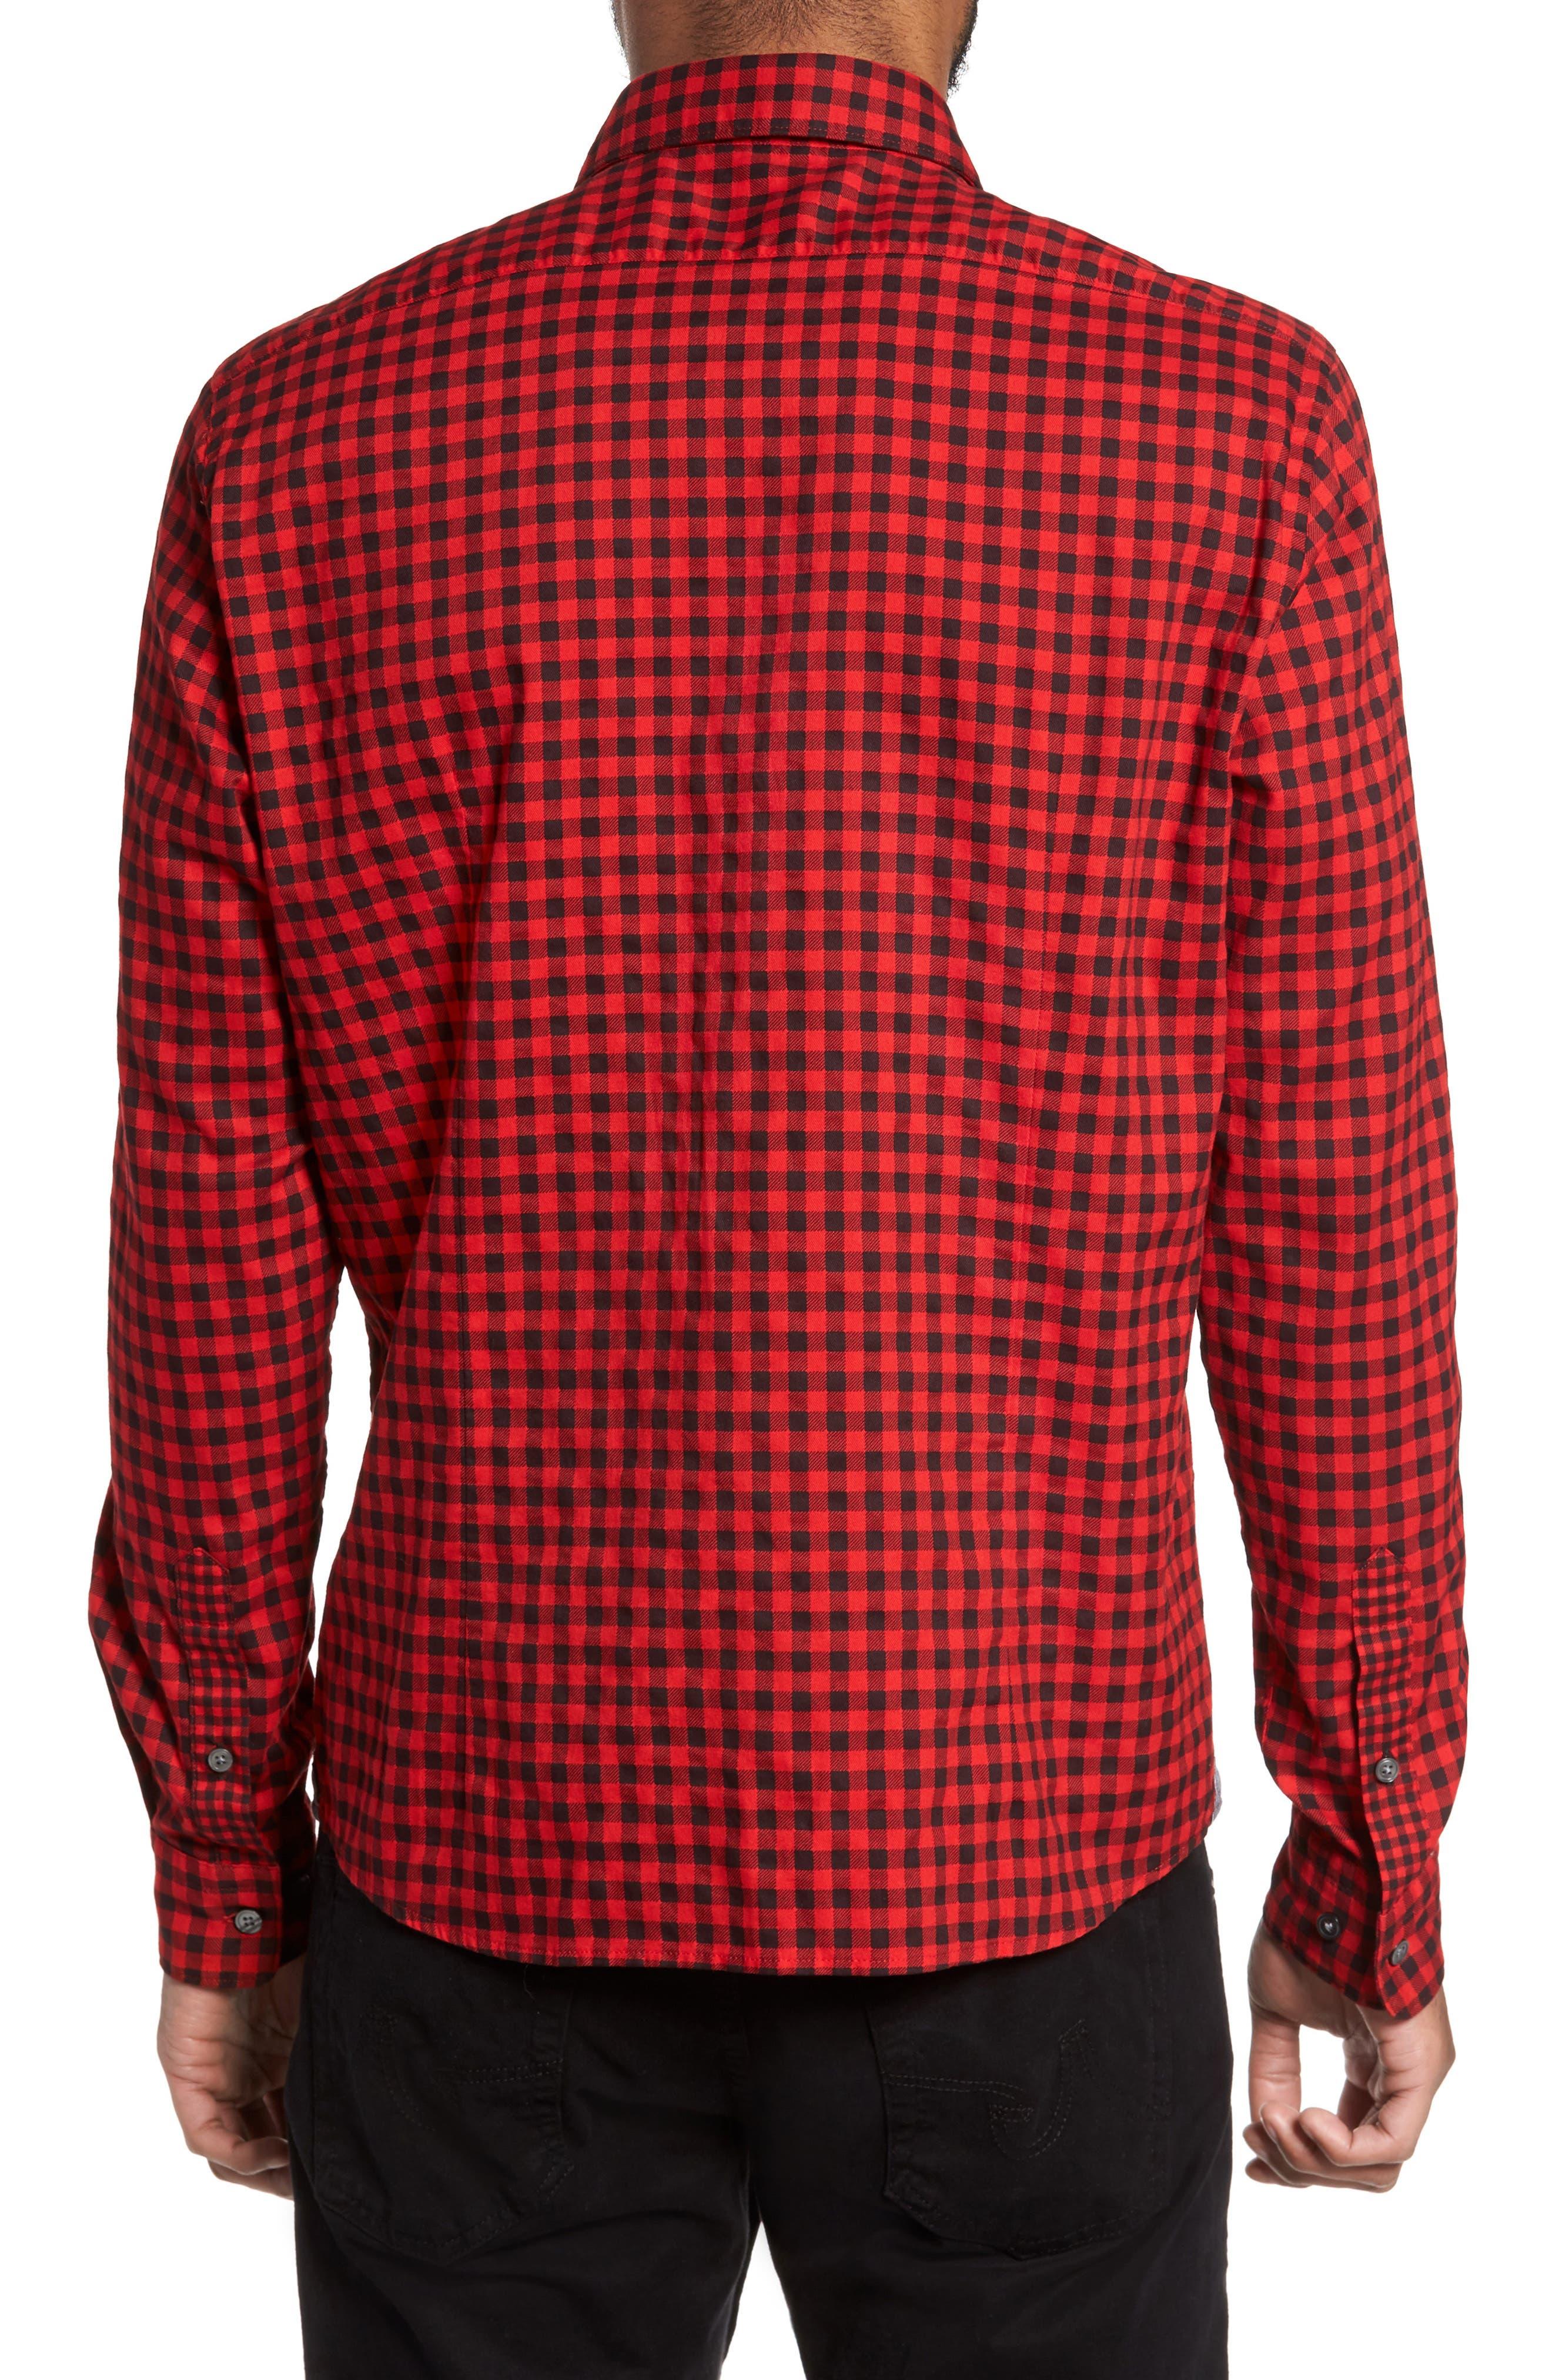 Lance Regular Fit Gingham Check Twill Sport Shirt,                             Alternate thumbnail 2, color,                             Red